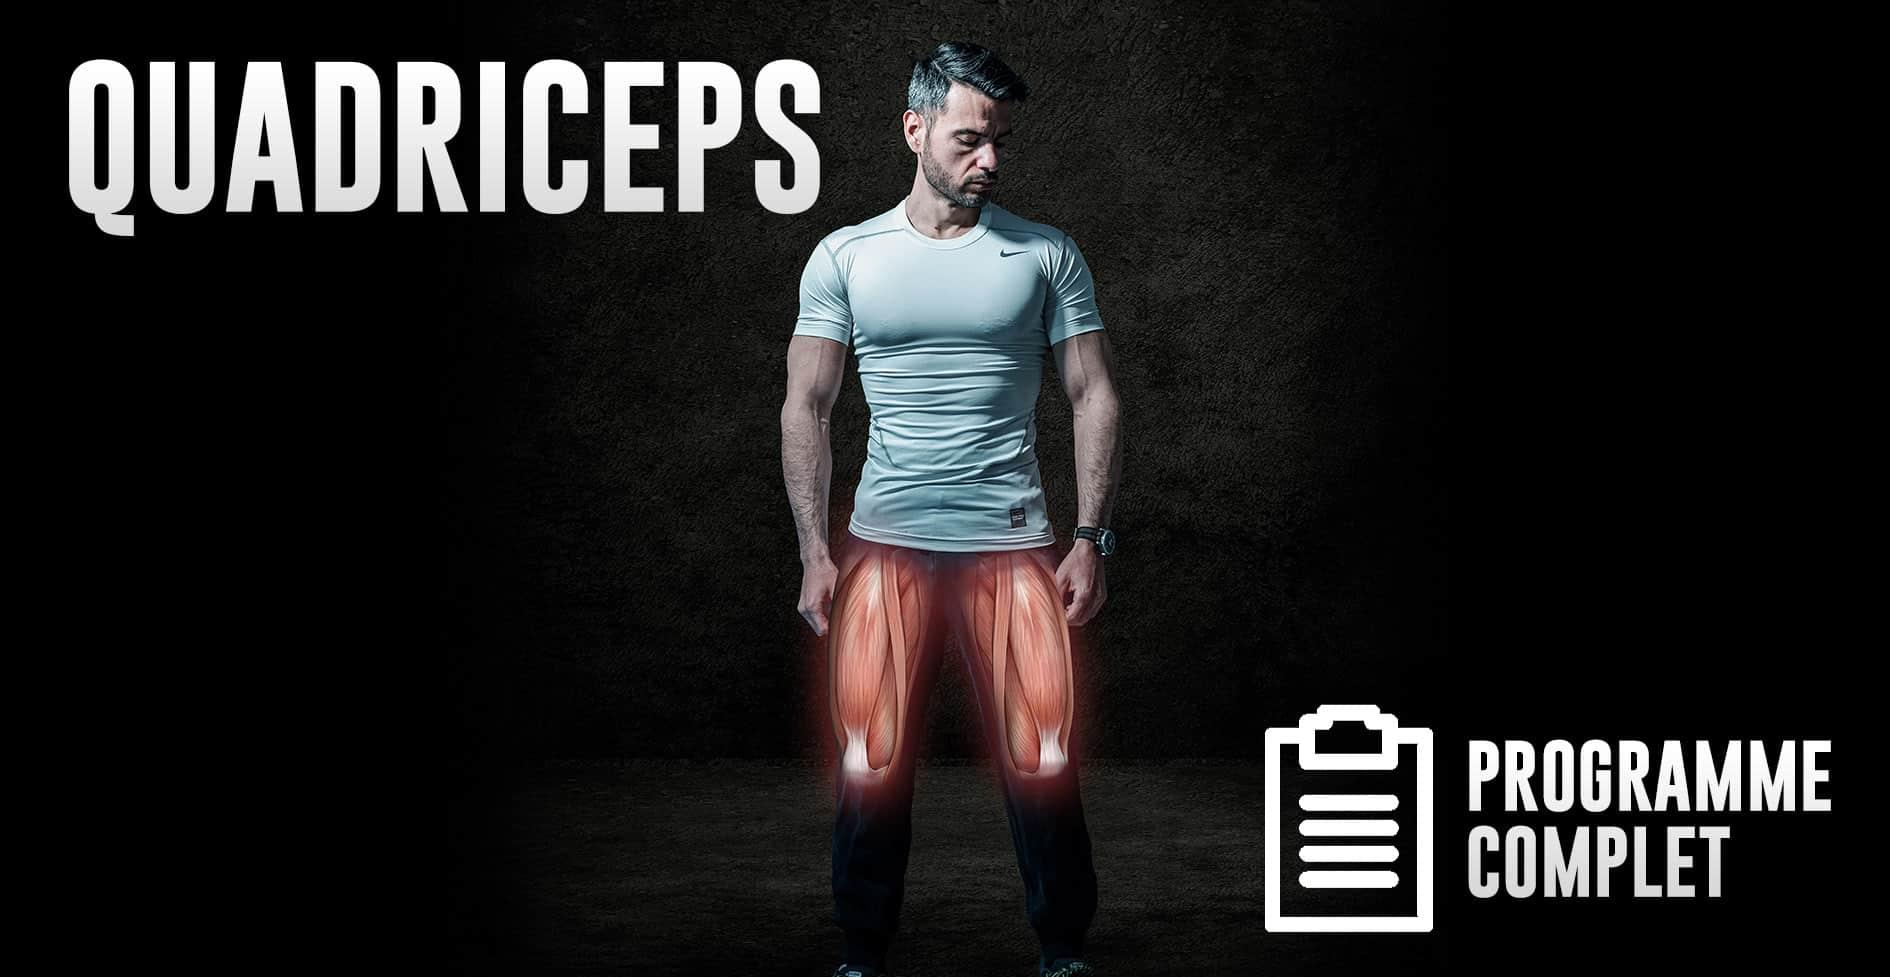 8 exercices pour muscler vos quadriceps